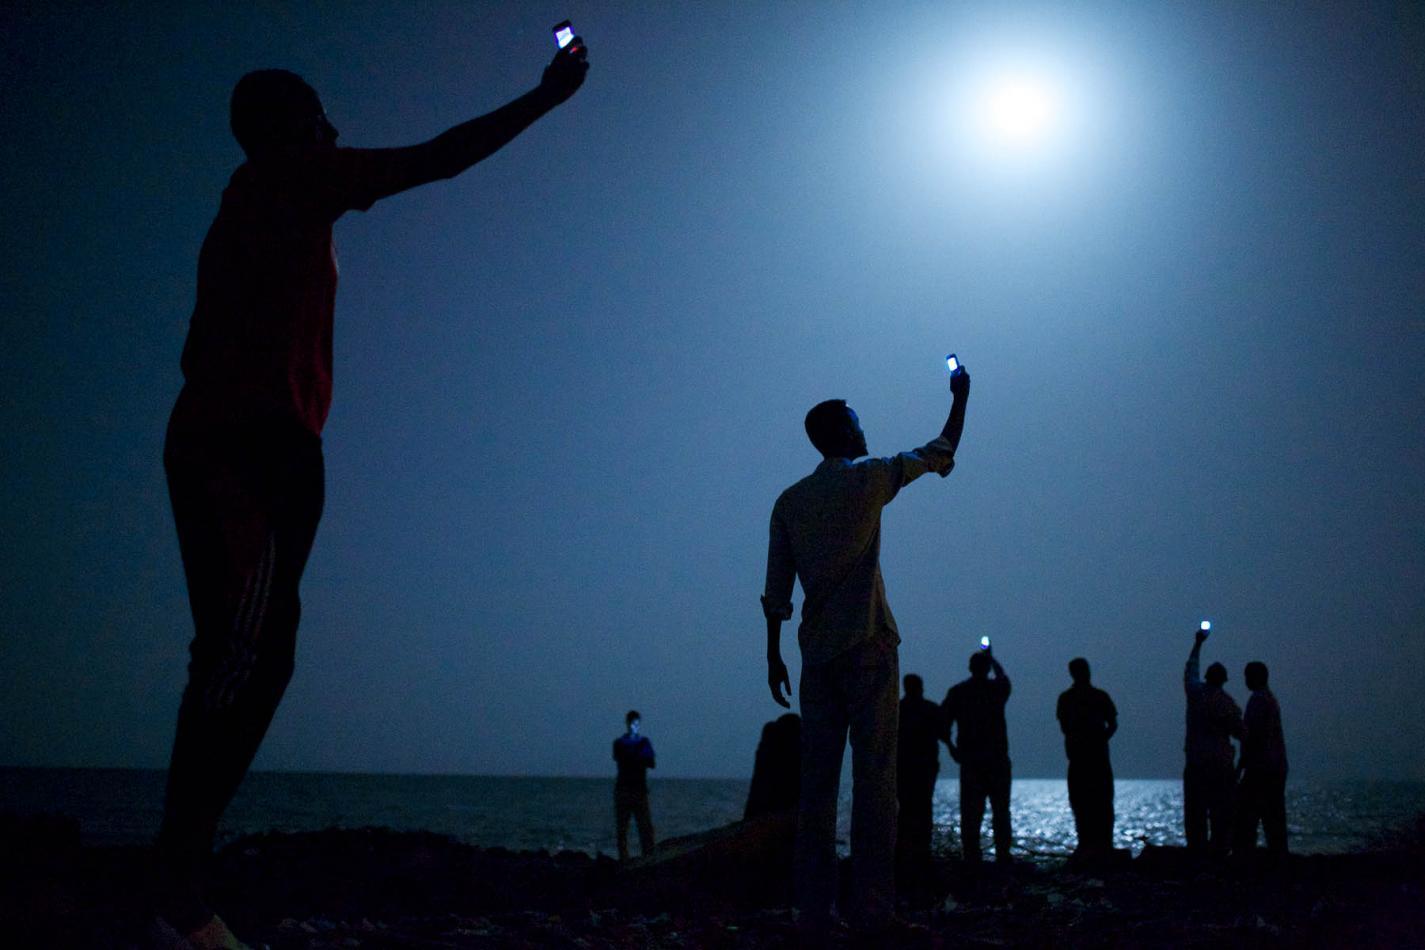 Enter the World Press Photo Contest 2017 (Win a Trip to Amsterdam)